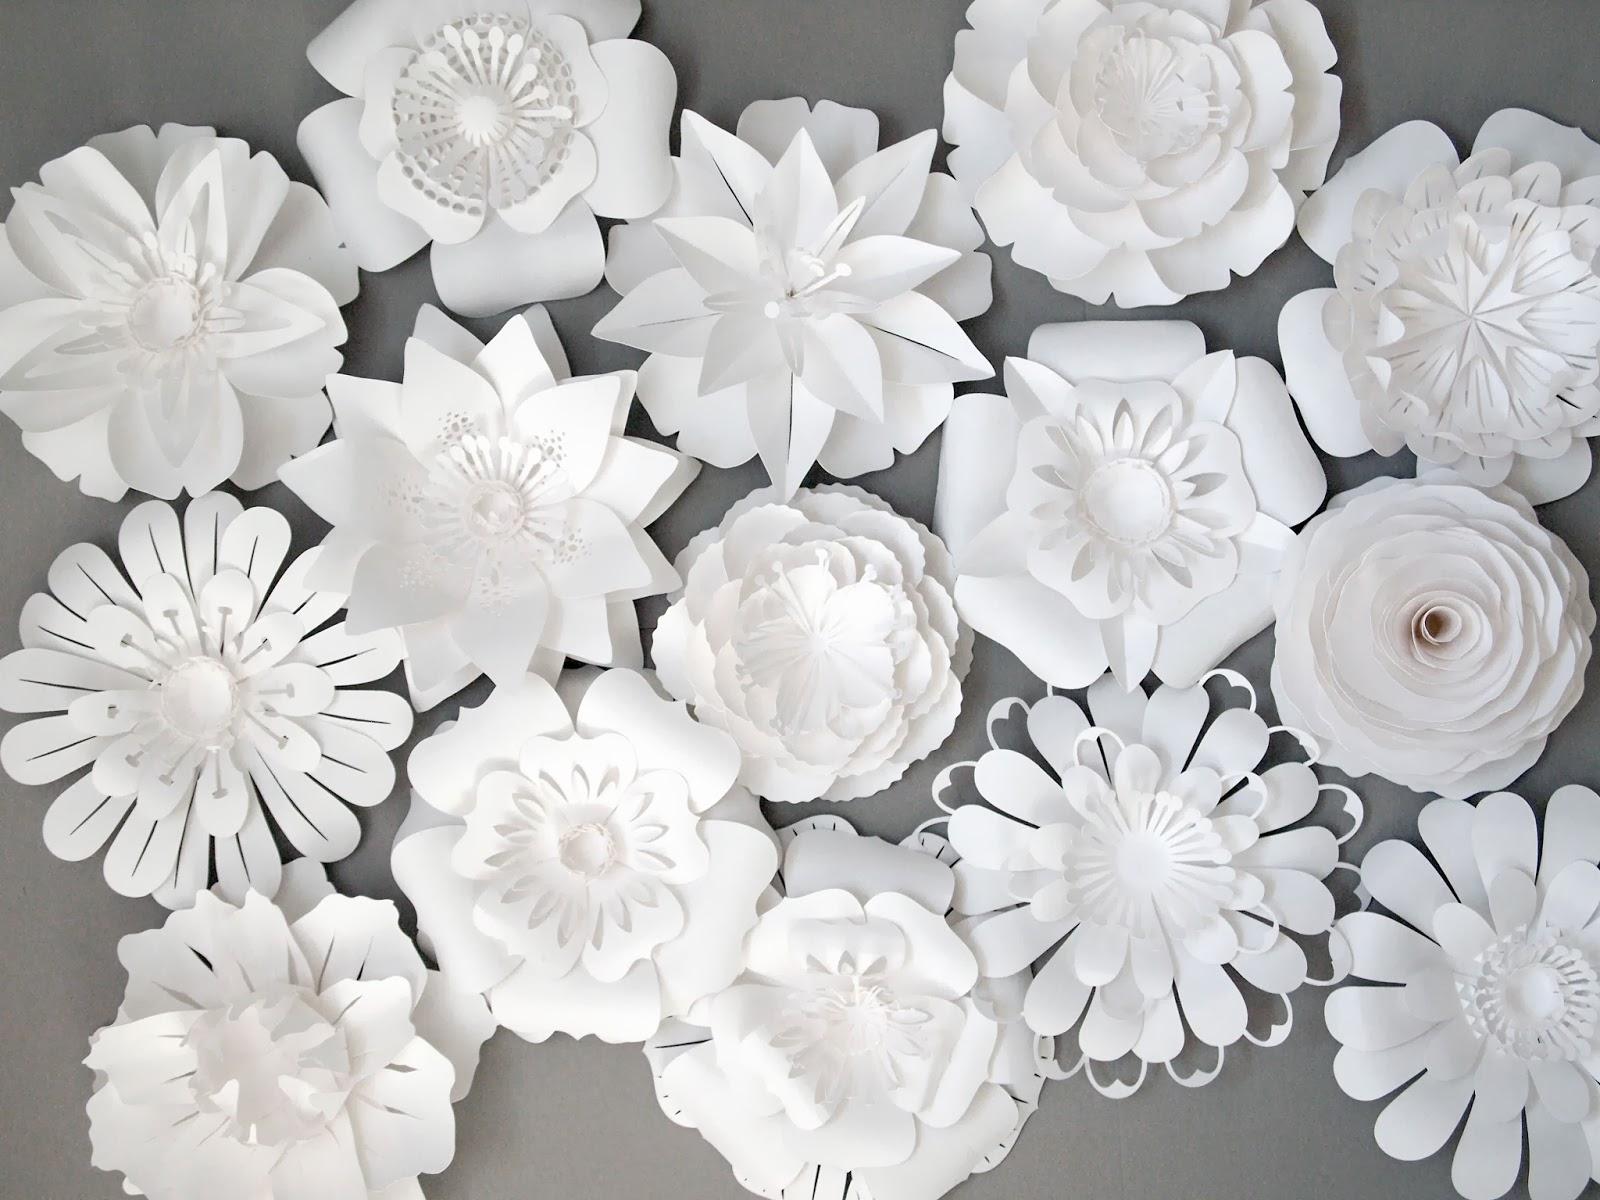 Flower White Paper Ukrandiffusion